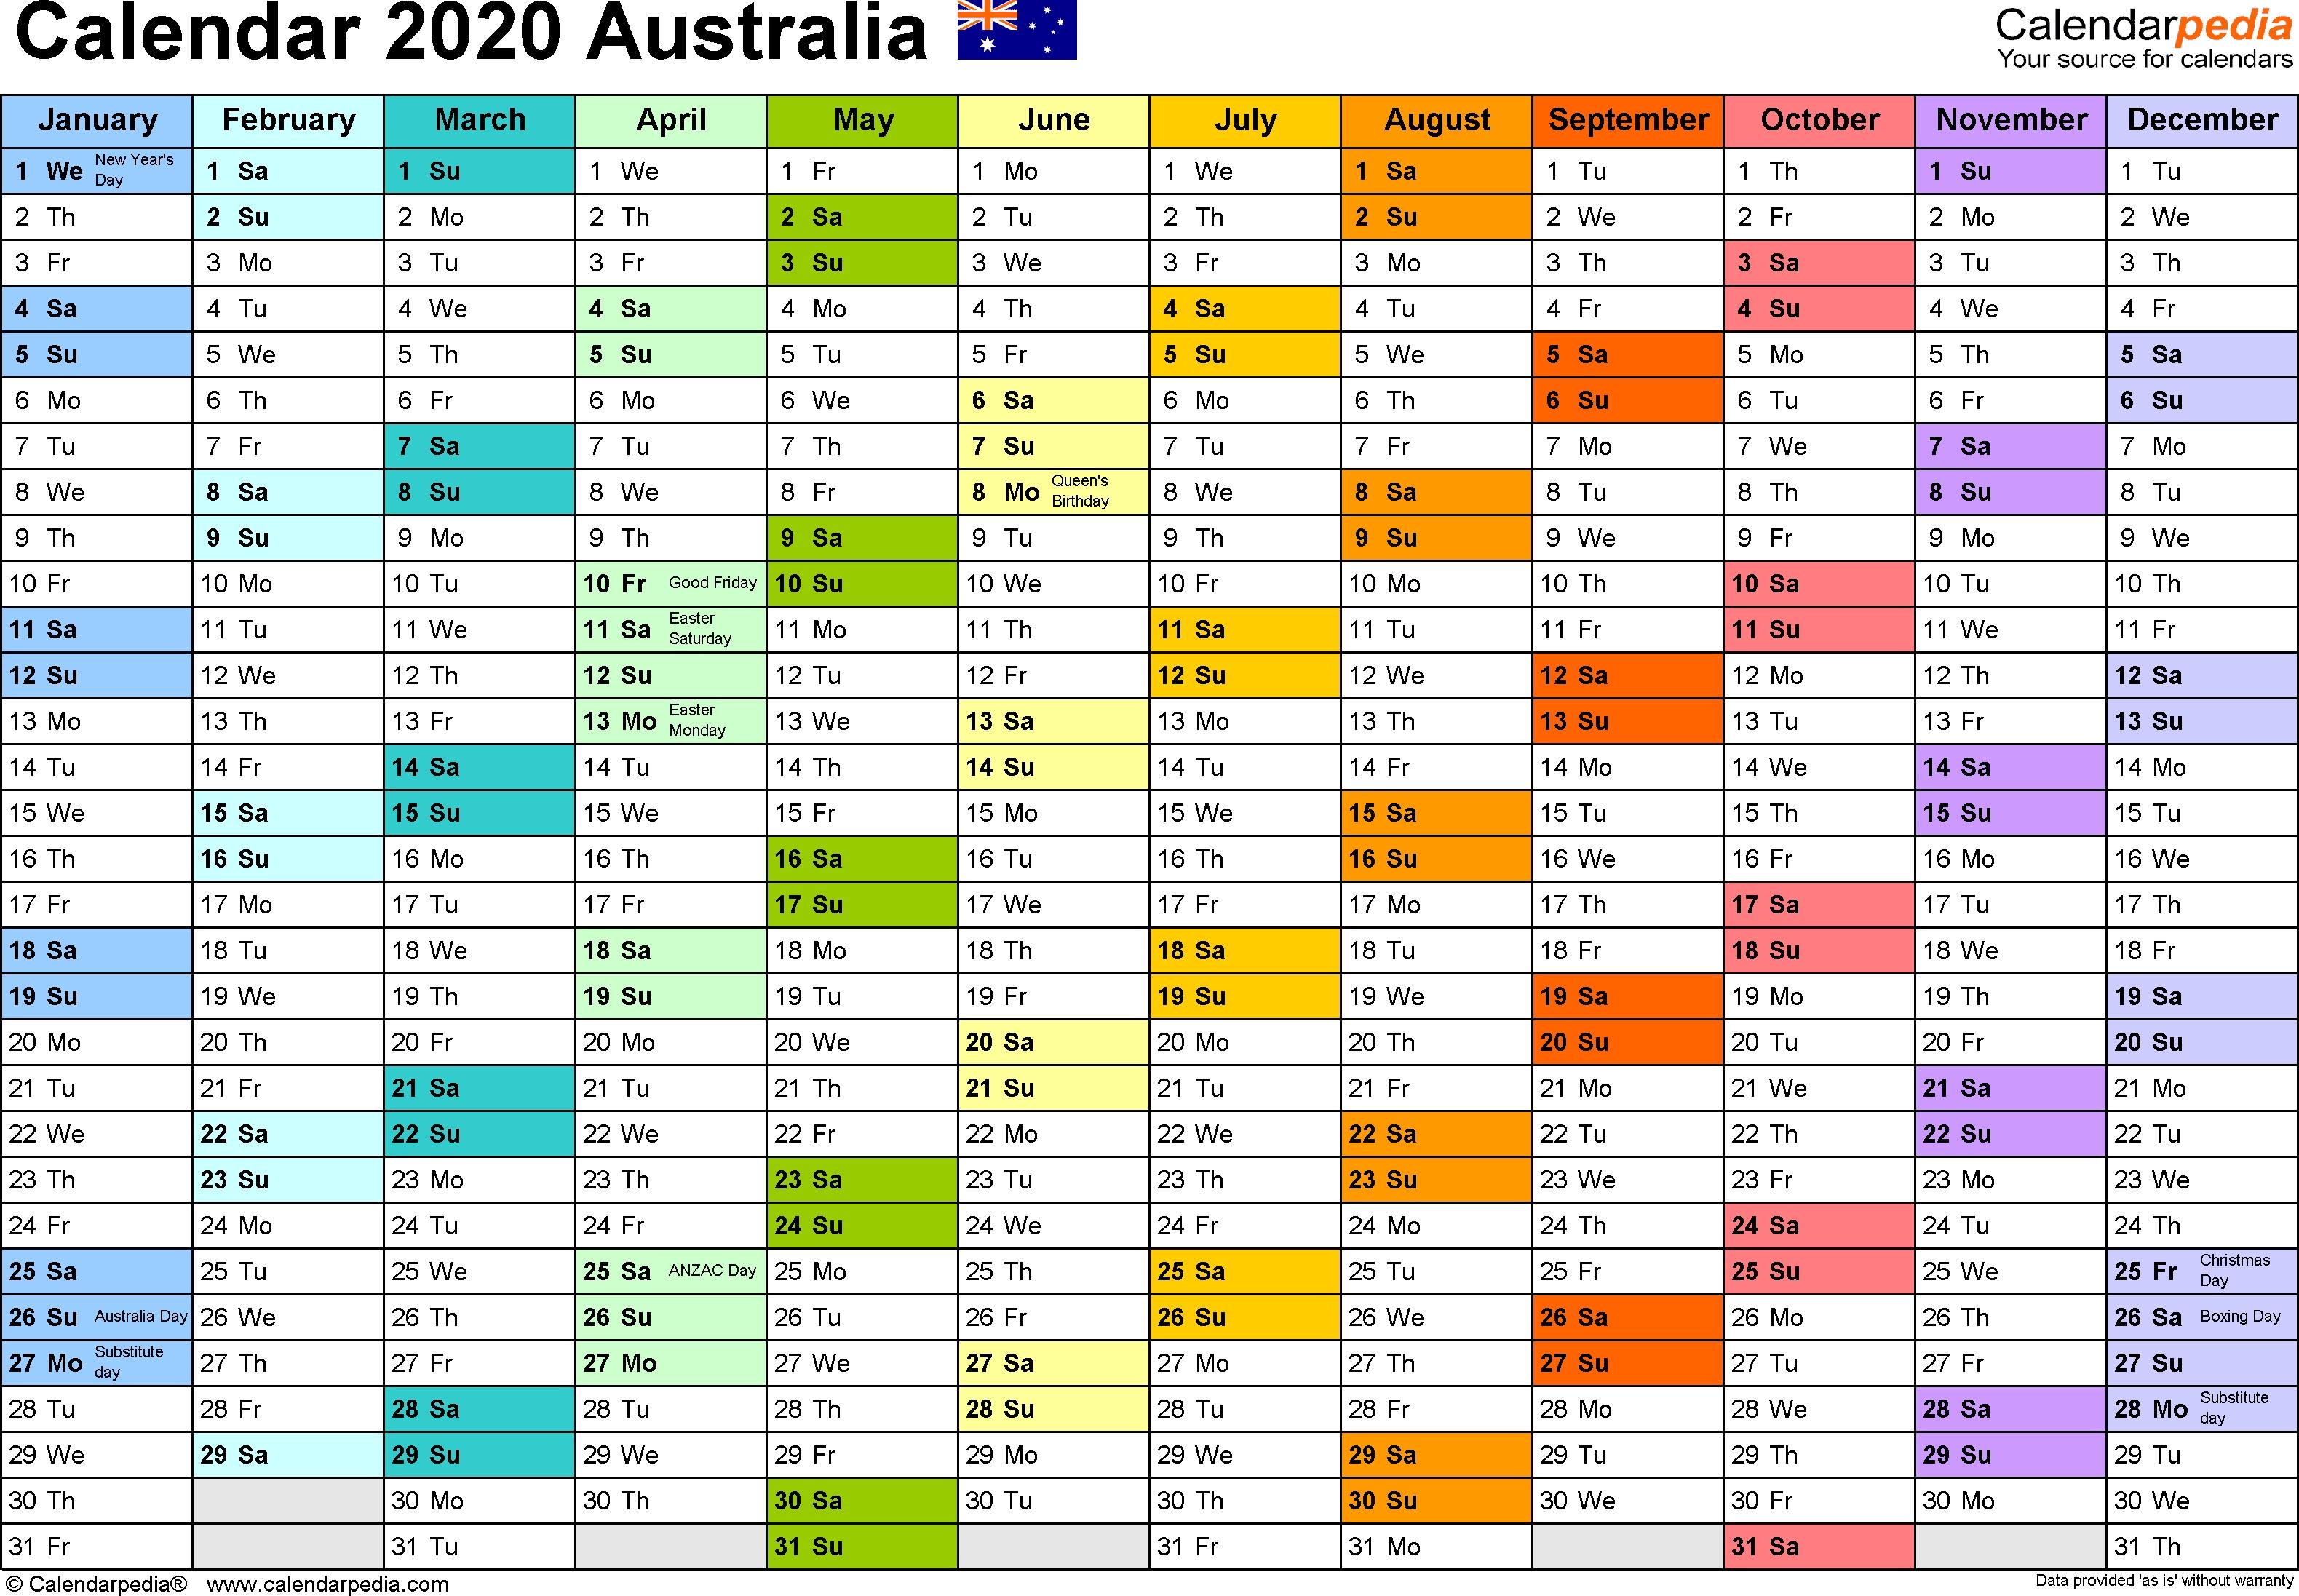 Australia Calendar 2020 - Free Printable Excel Templates  Australian Financial Year 2020